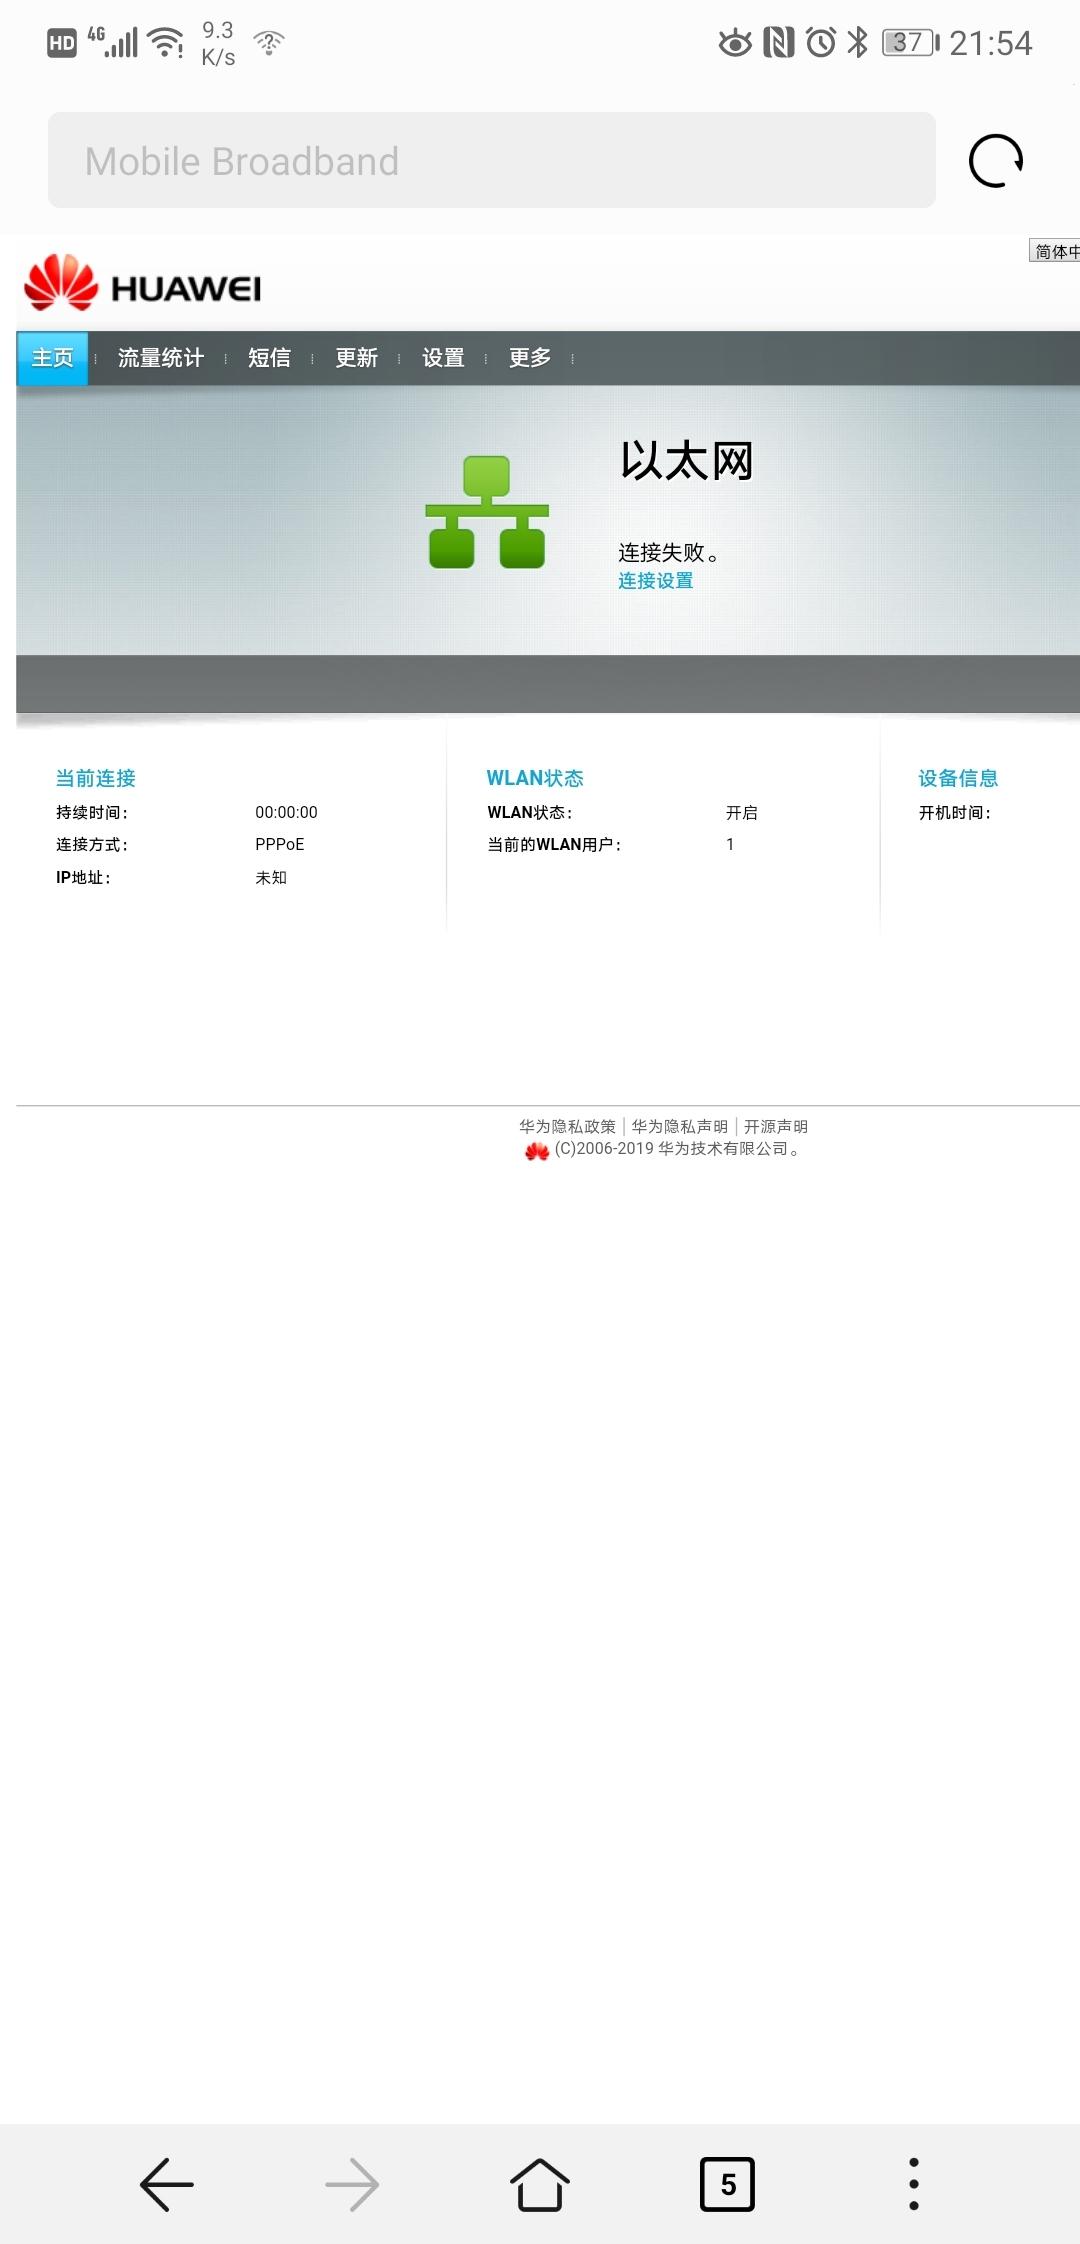 Screenshot_20200511_215411_com.android.browser.jpg